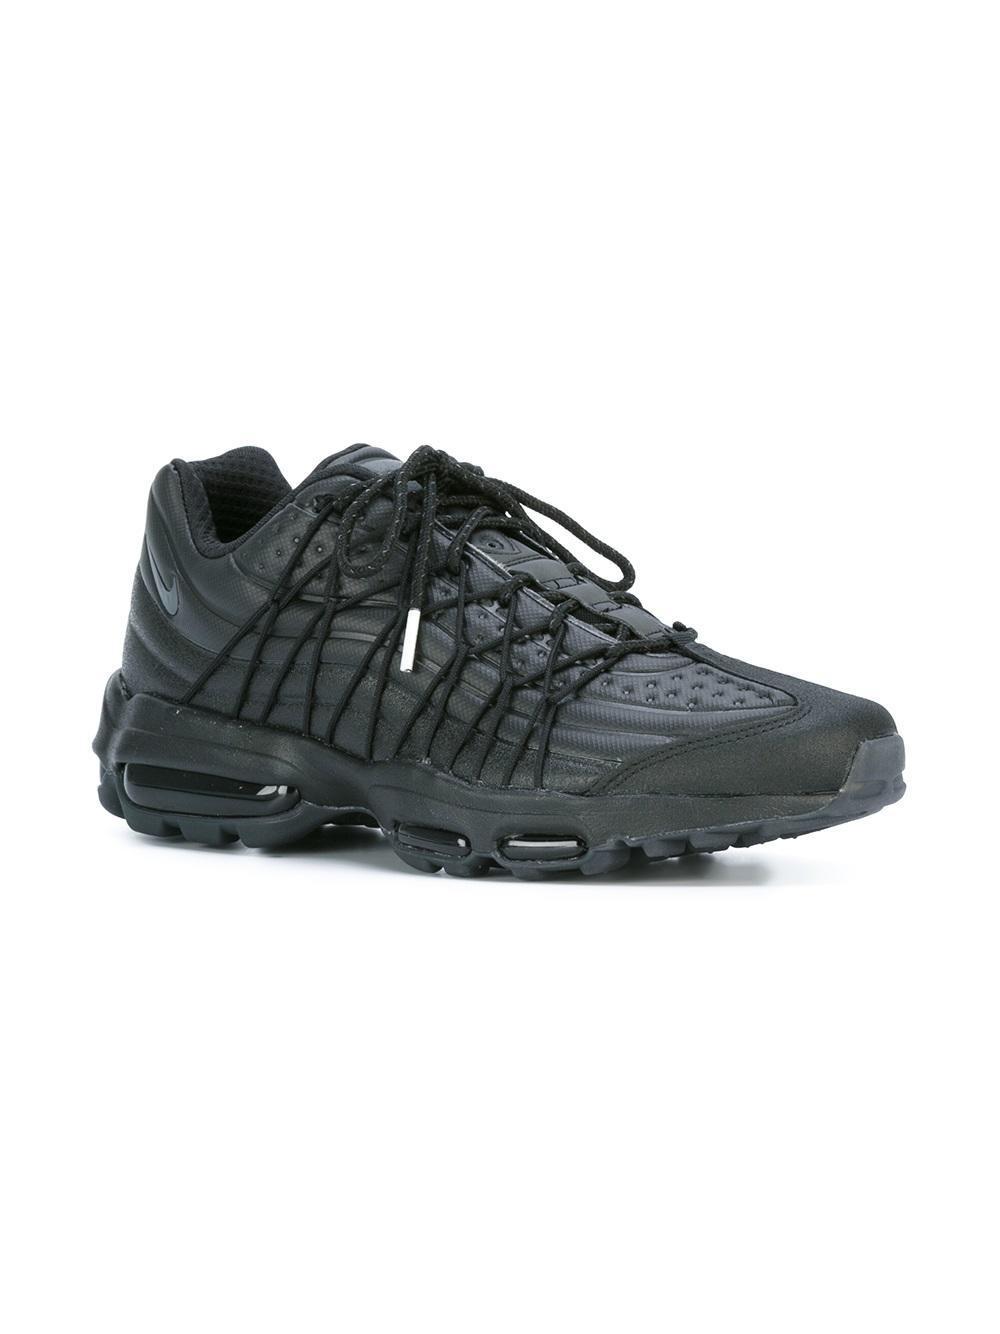 nike air max 95 ultra jcrd scarpe in nero per gli uomini lyst